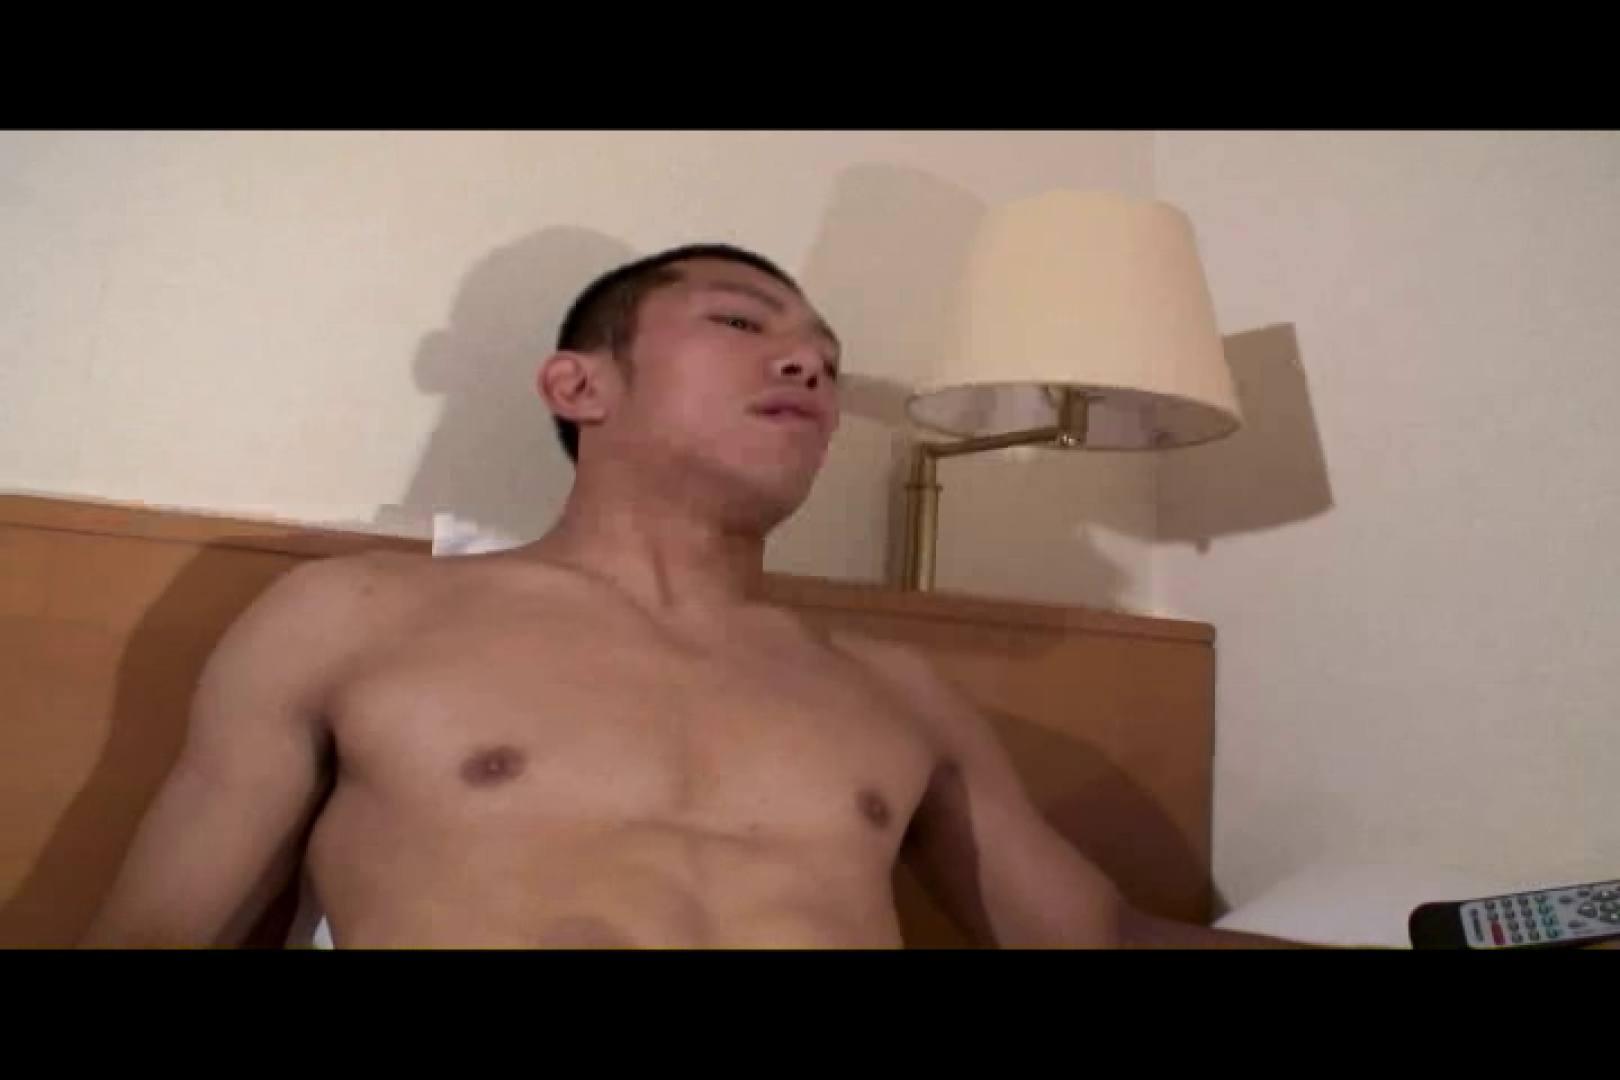 Bistro「イケメン」~Mokkori和風仕立て~vol.04 スポーツマン | マッチョ  90枚 21